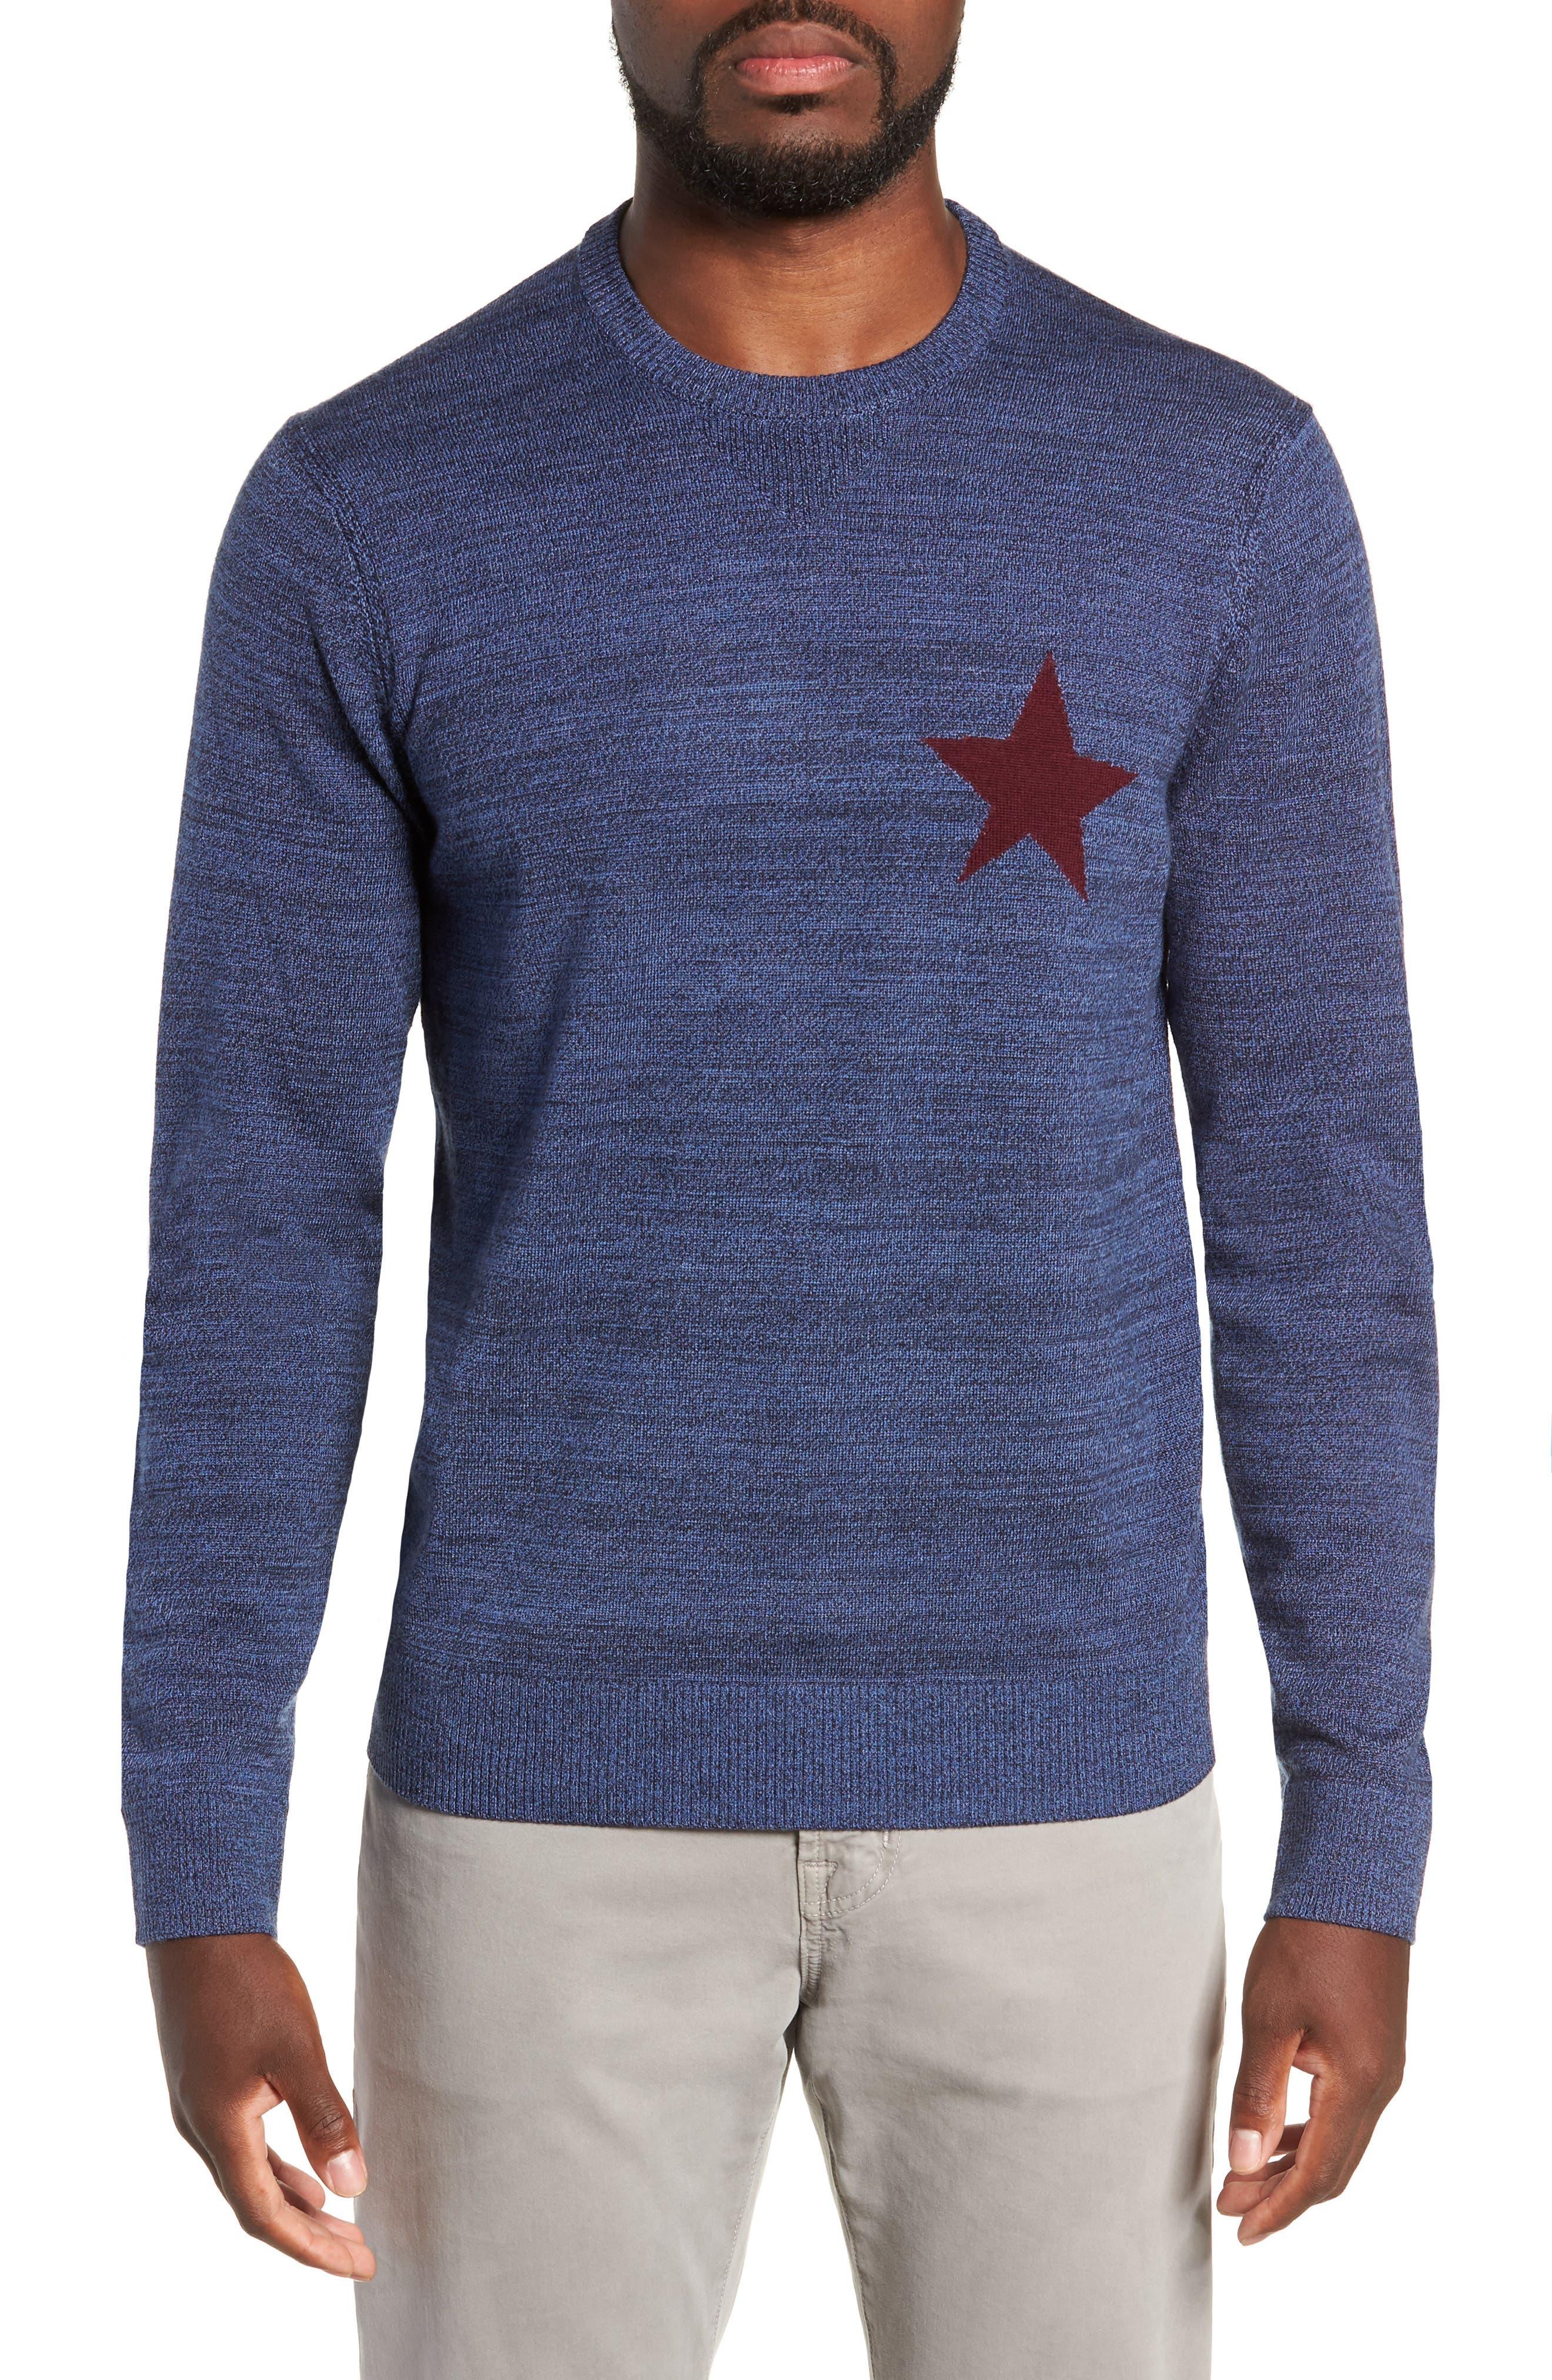 Intaria Star Merino Wool Sweater,                             Main thumbnail 1, color,                             BLUE